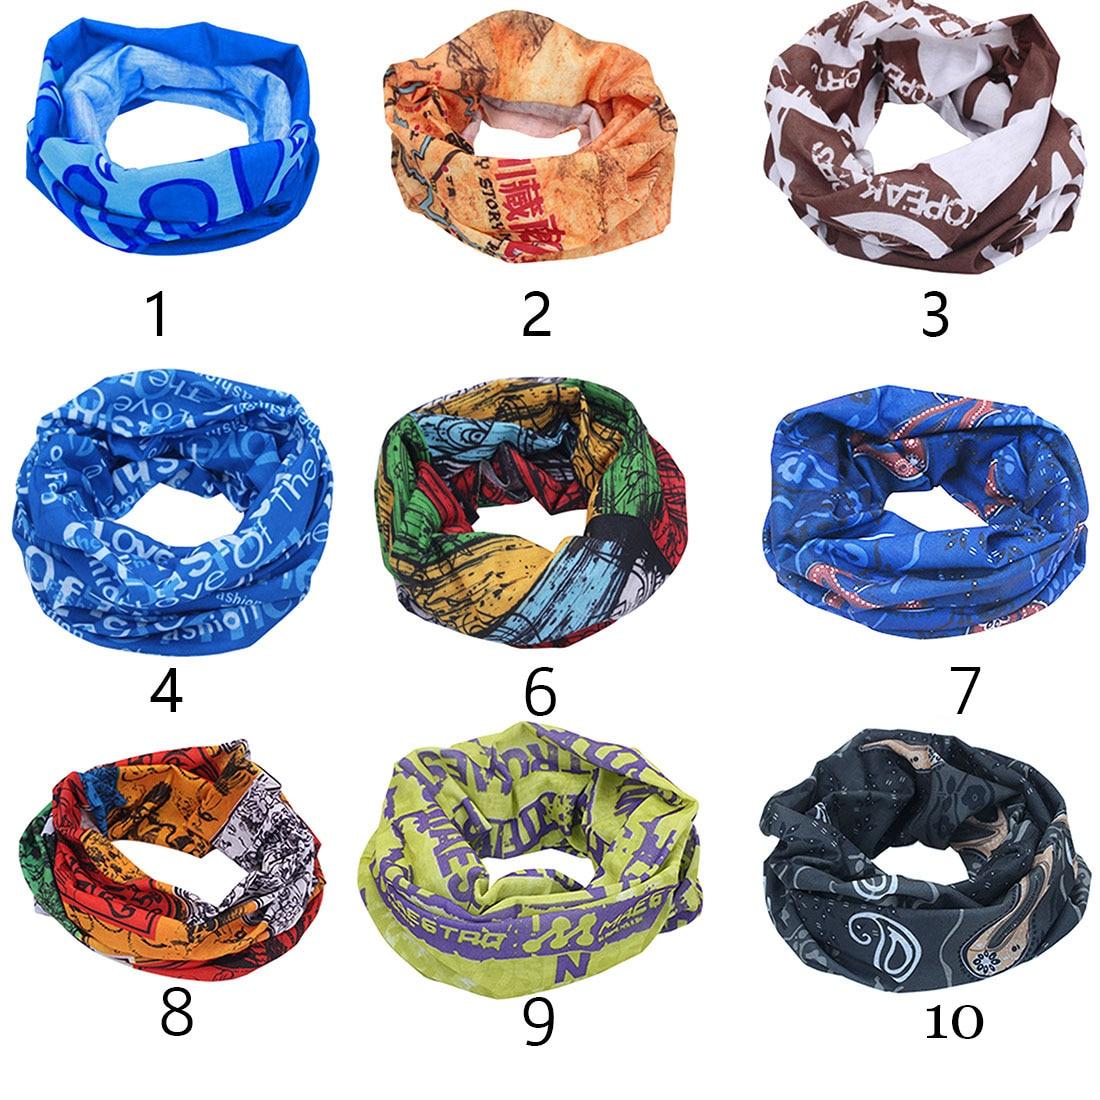 1PC Outdoor Sport Camping & Hiking Scarves Cycling Bicycle Head Scarf Magic Headband Face Mask Snood Bandana neck warmer недорого